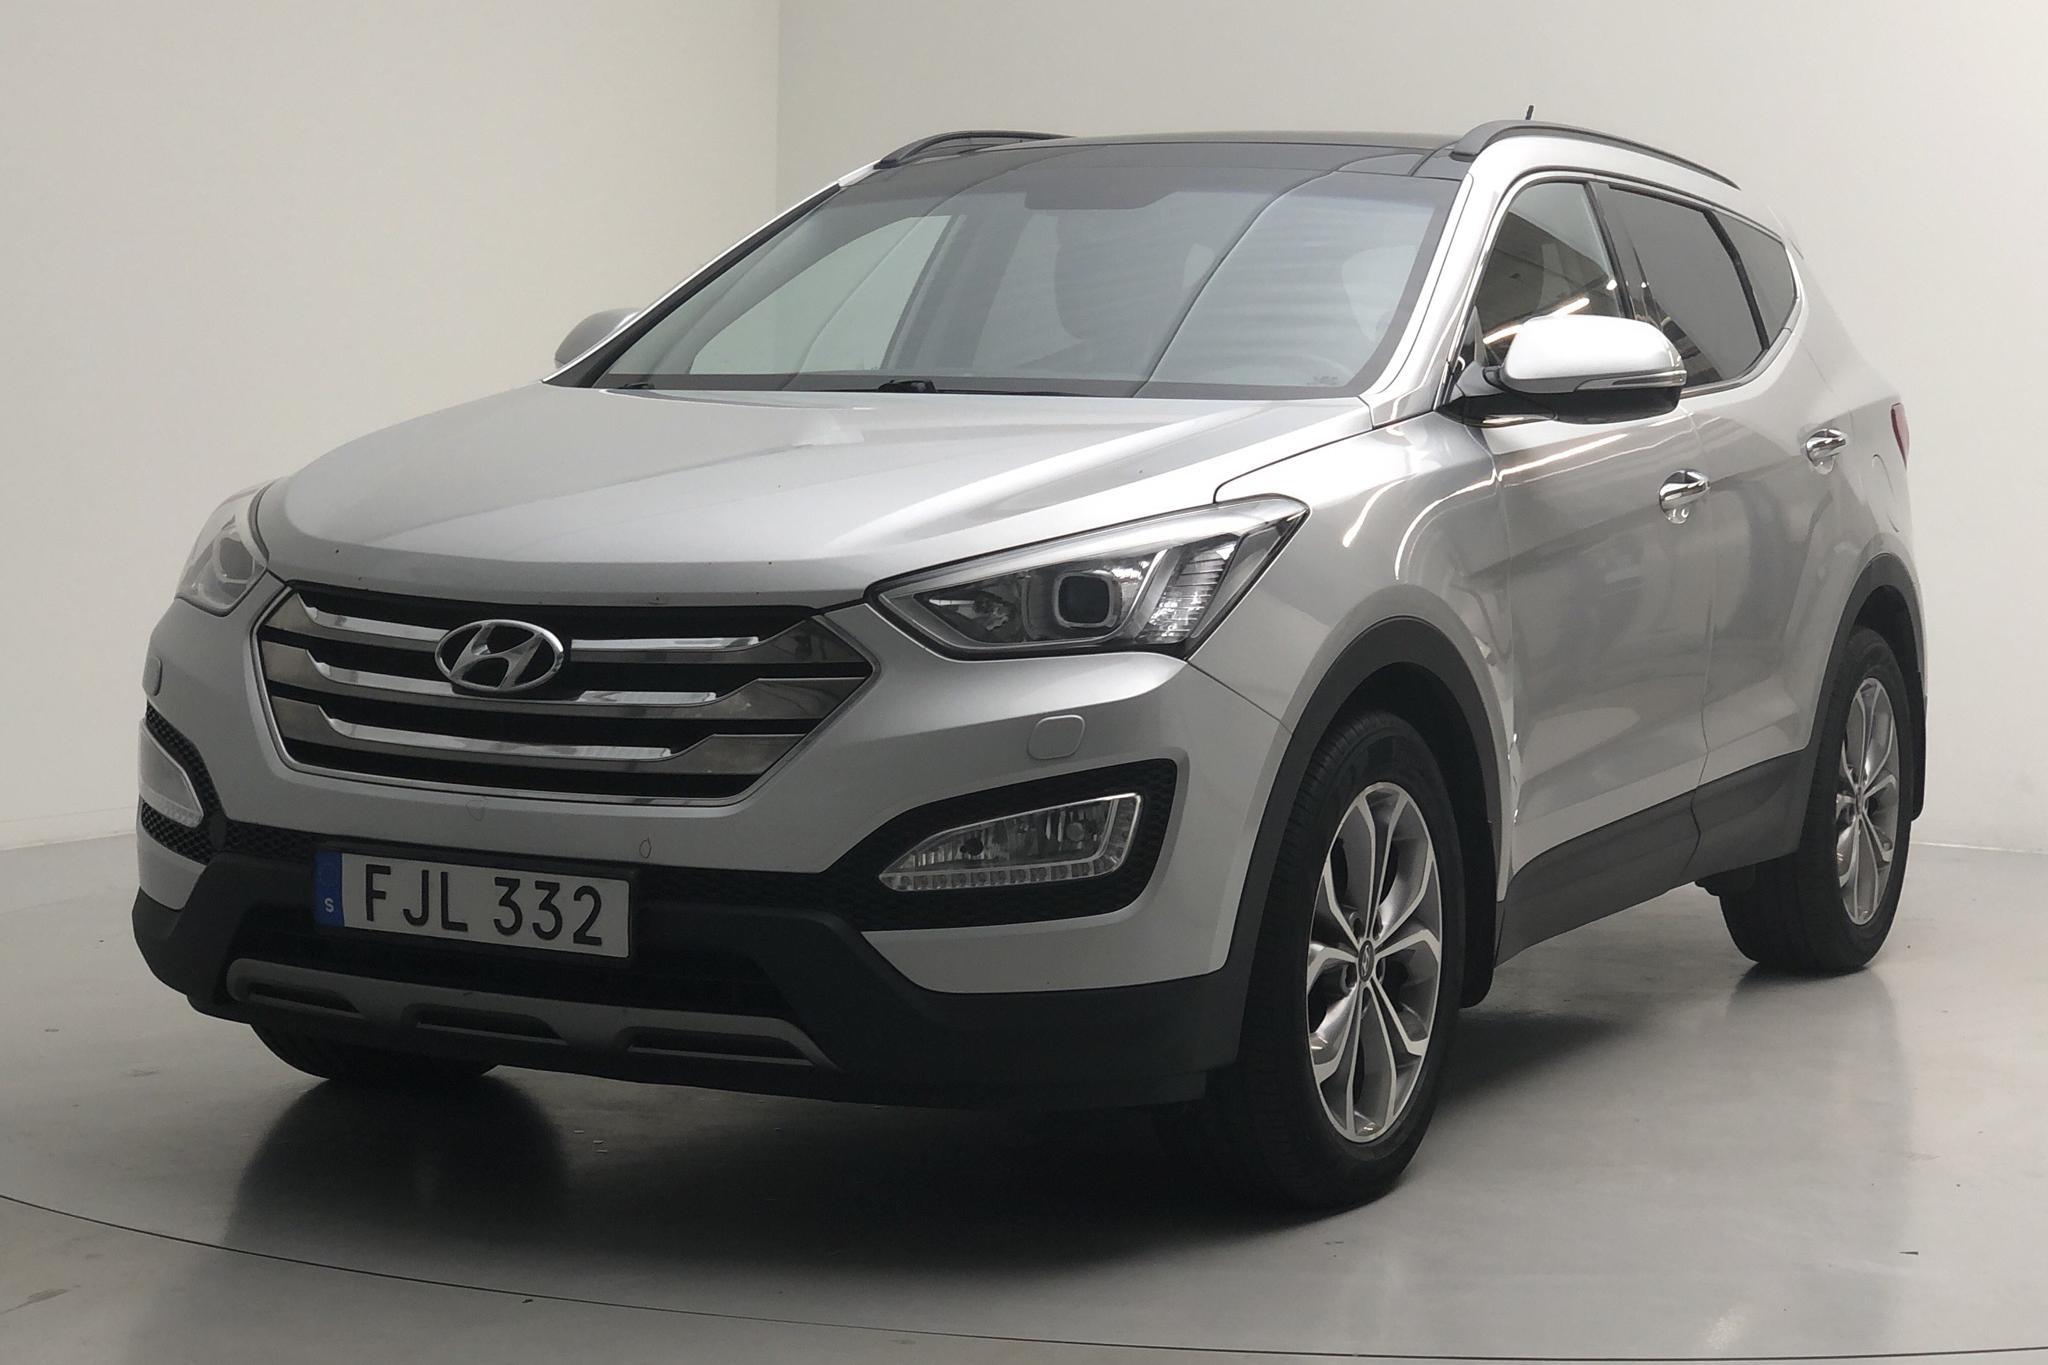 Hyundai Santa Fé 2.2 CRDi-R 4WD (197hk) - 219 570 km - Automatic - silver - 2014